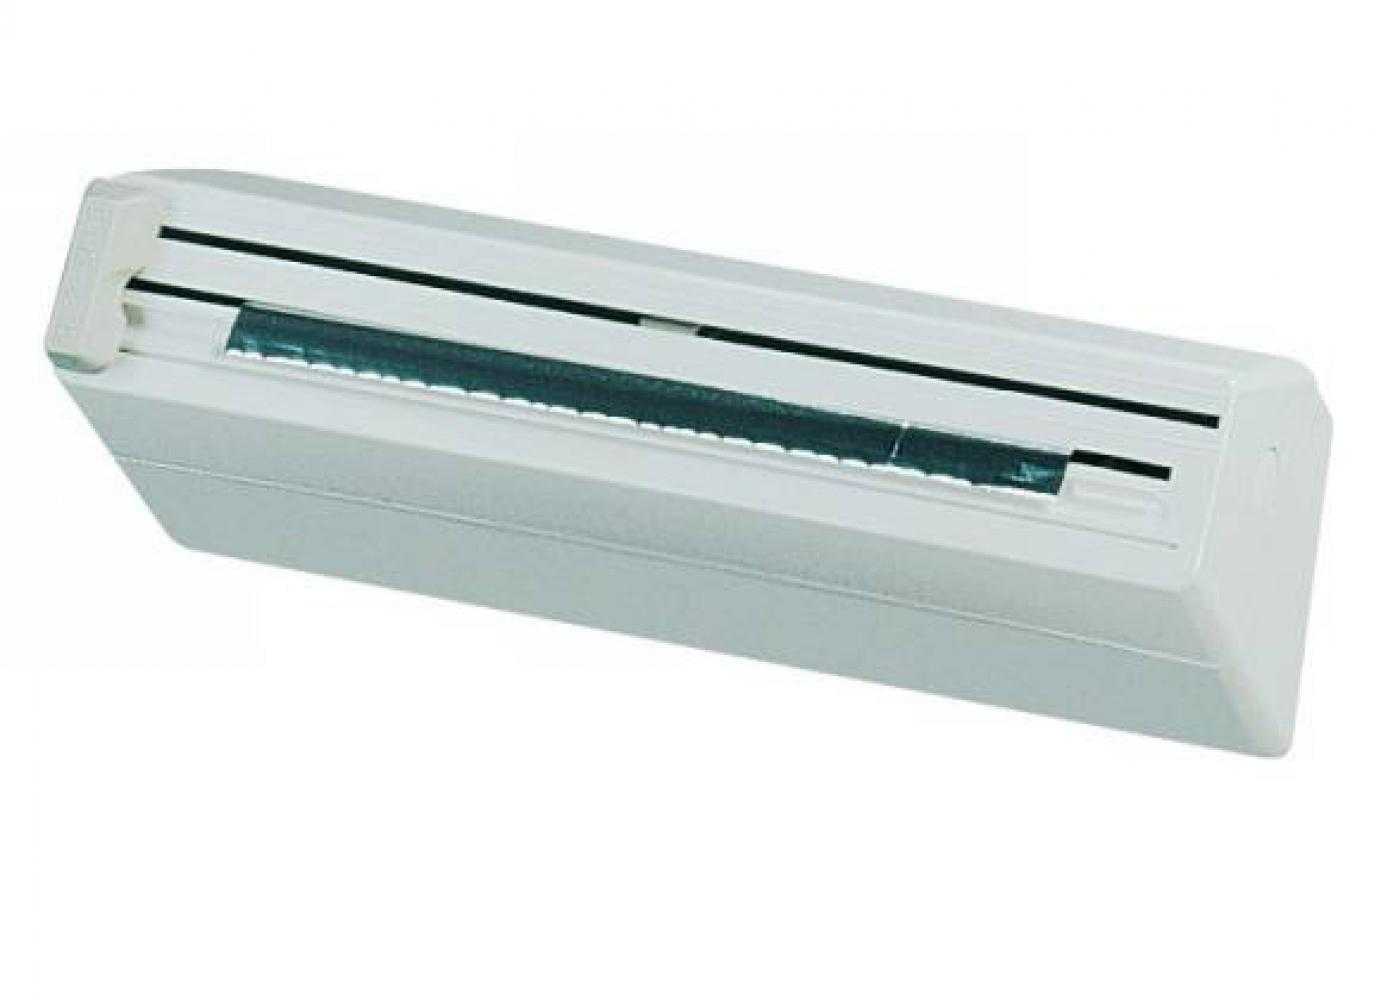 Acquista Devolgitore Pellicola Ed Alluminio 17545772 | Glooke.com